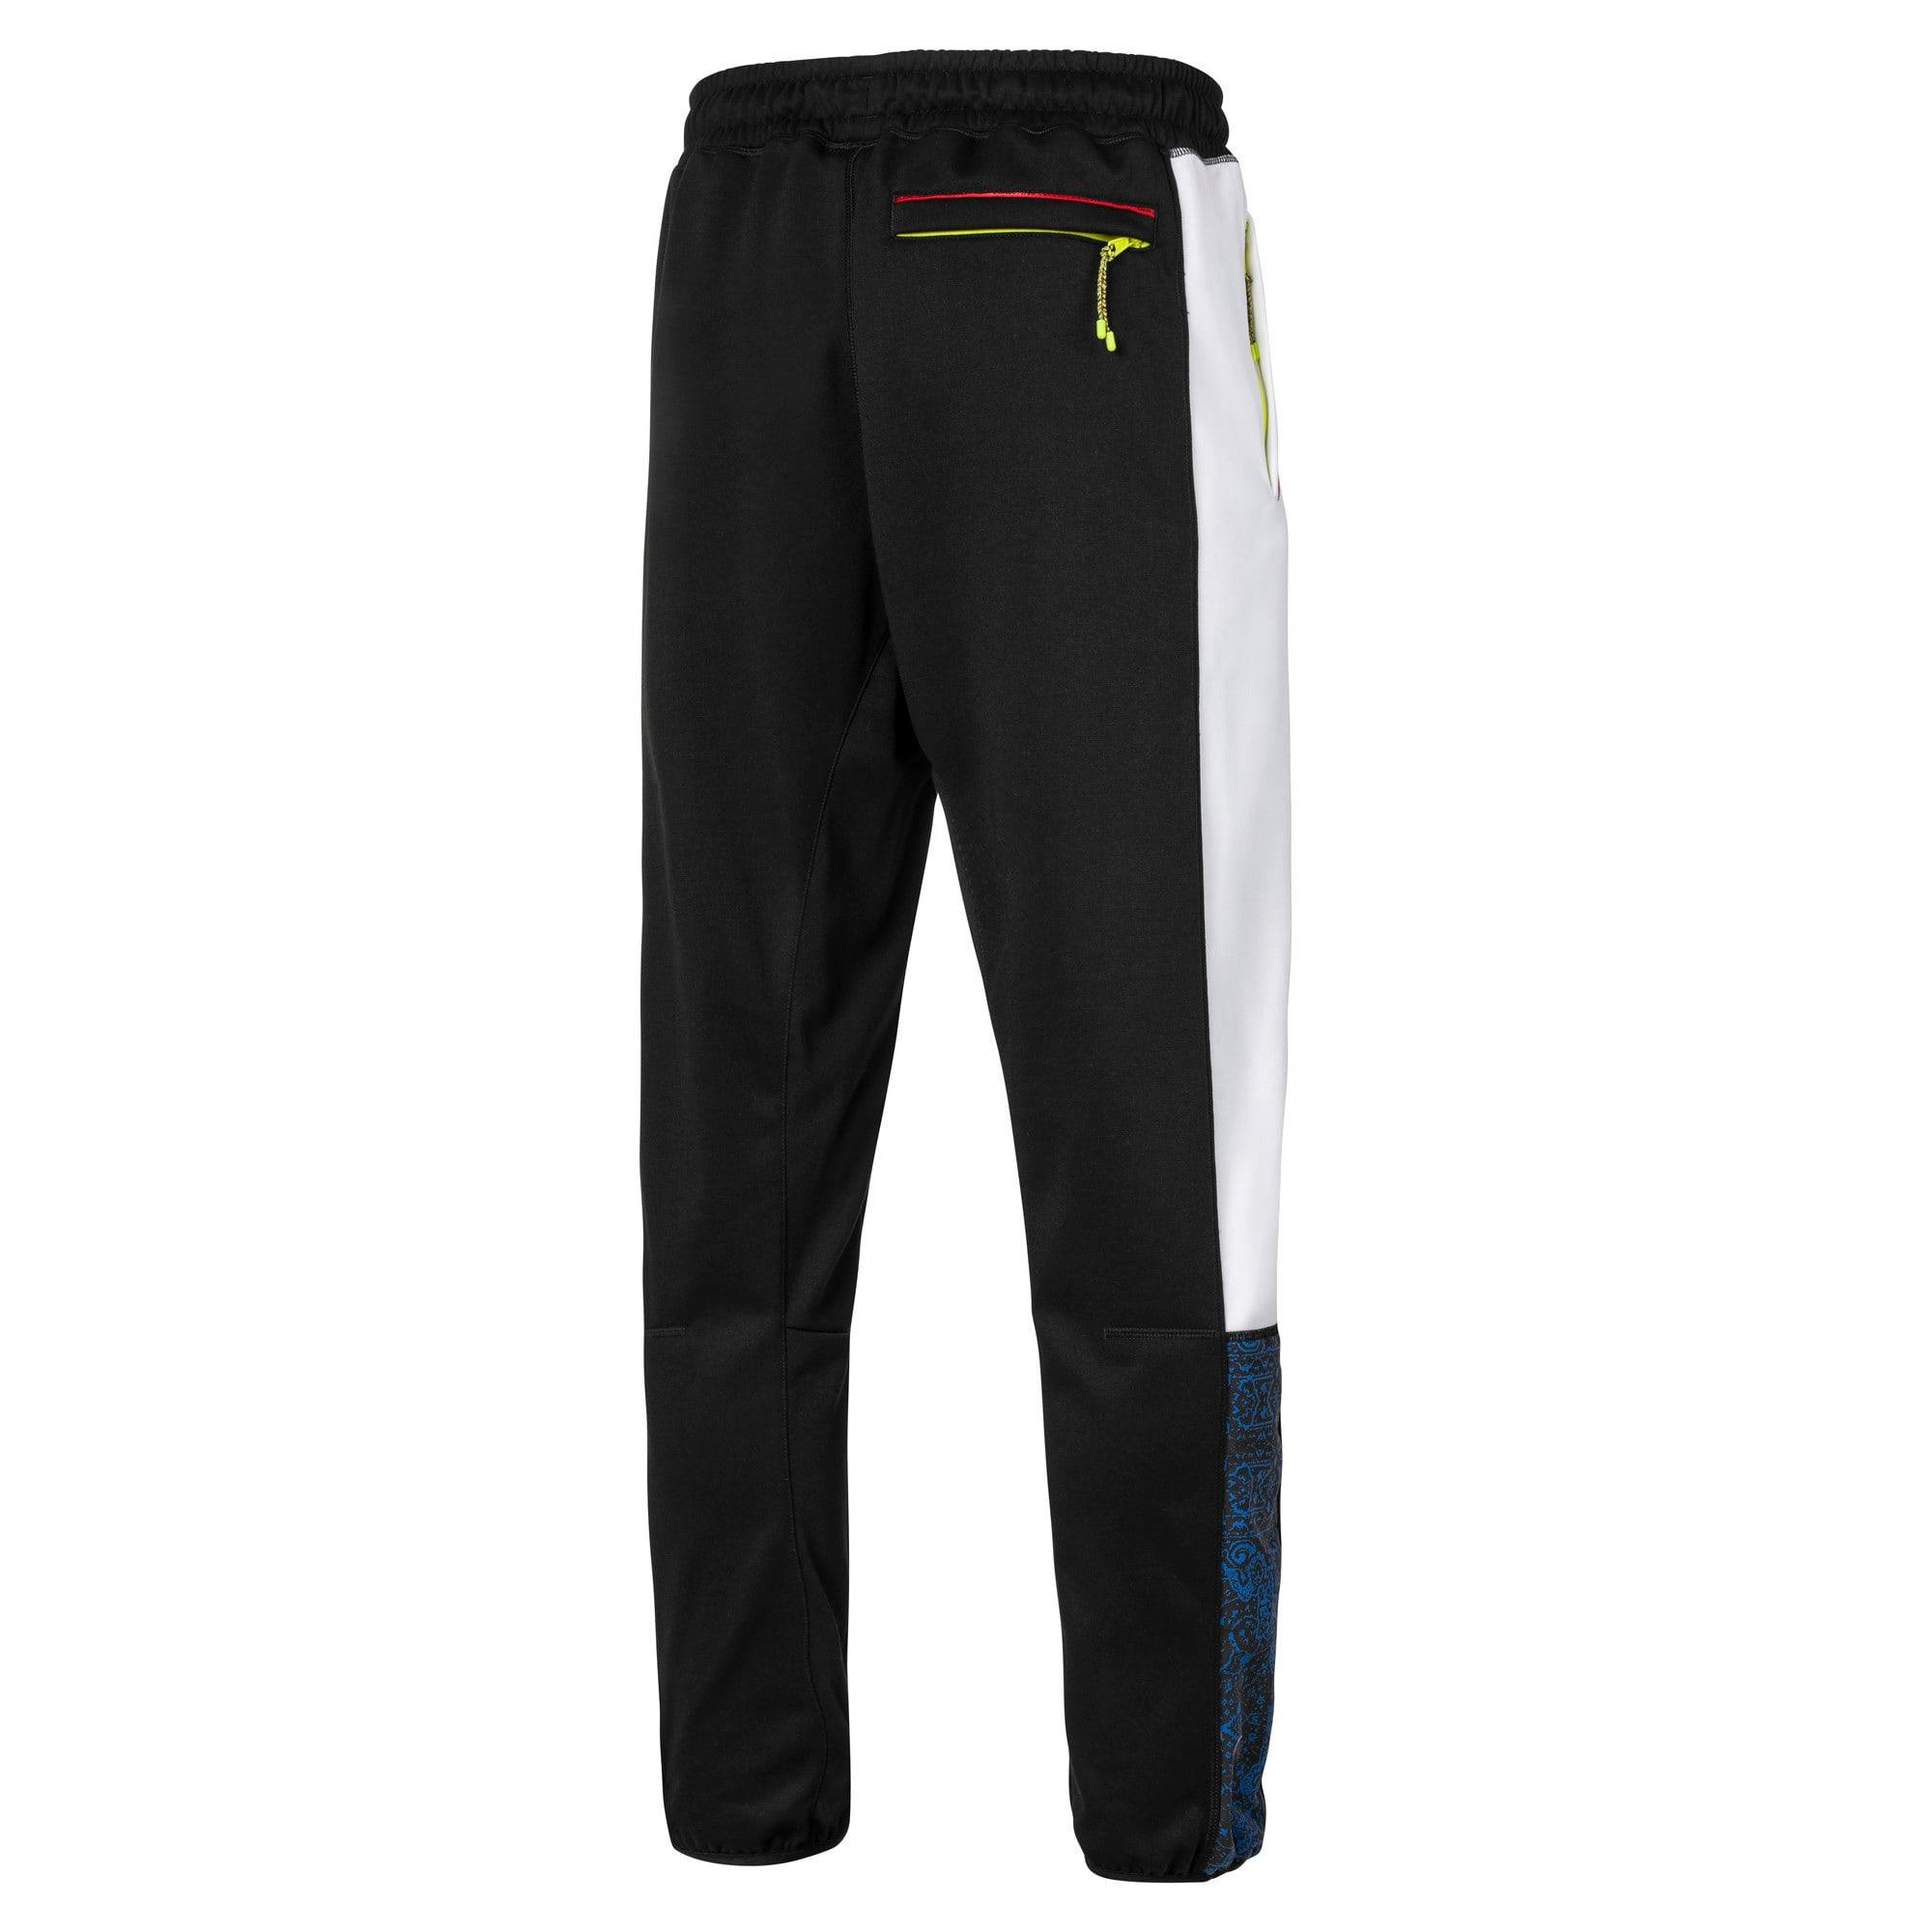 Miniatura 5 de Pantalones deportivos PUMA x LES BENJAMINS para hombre, Puma White, mediano